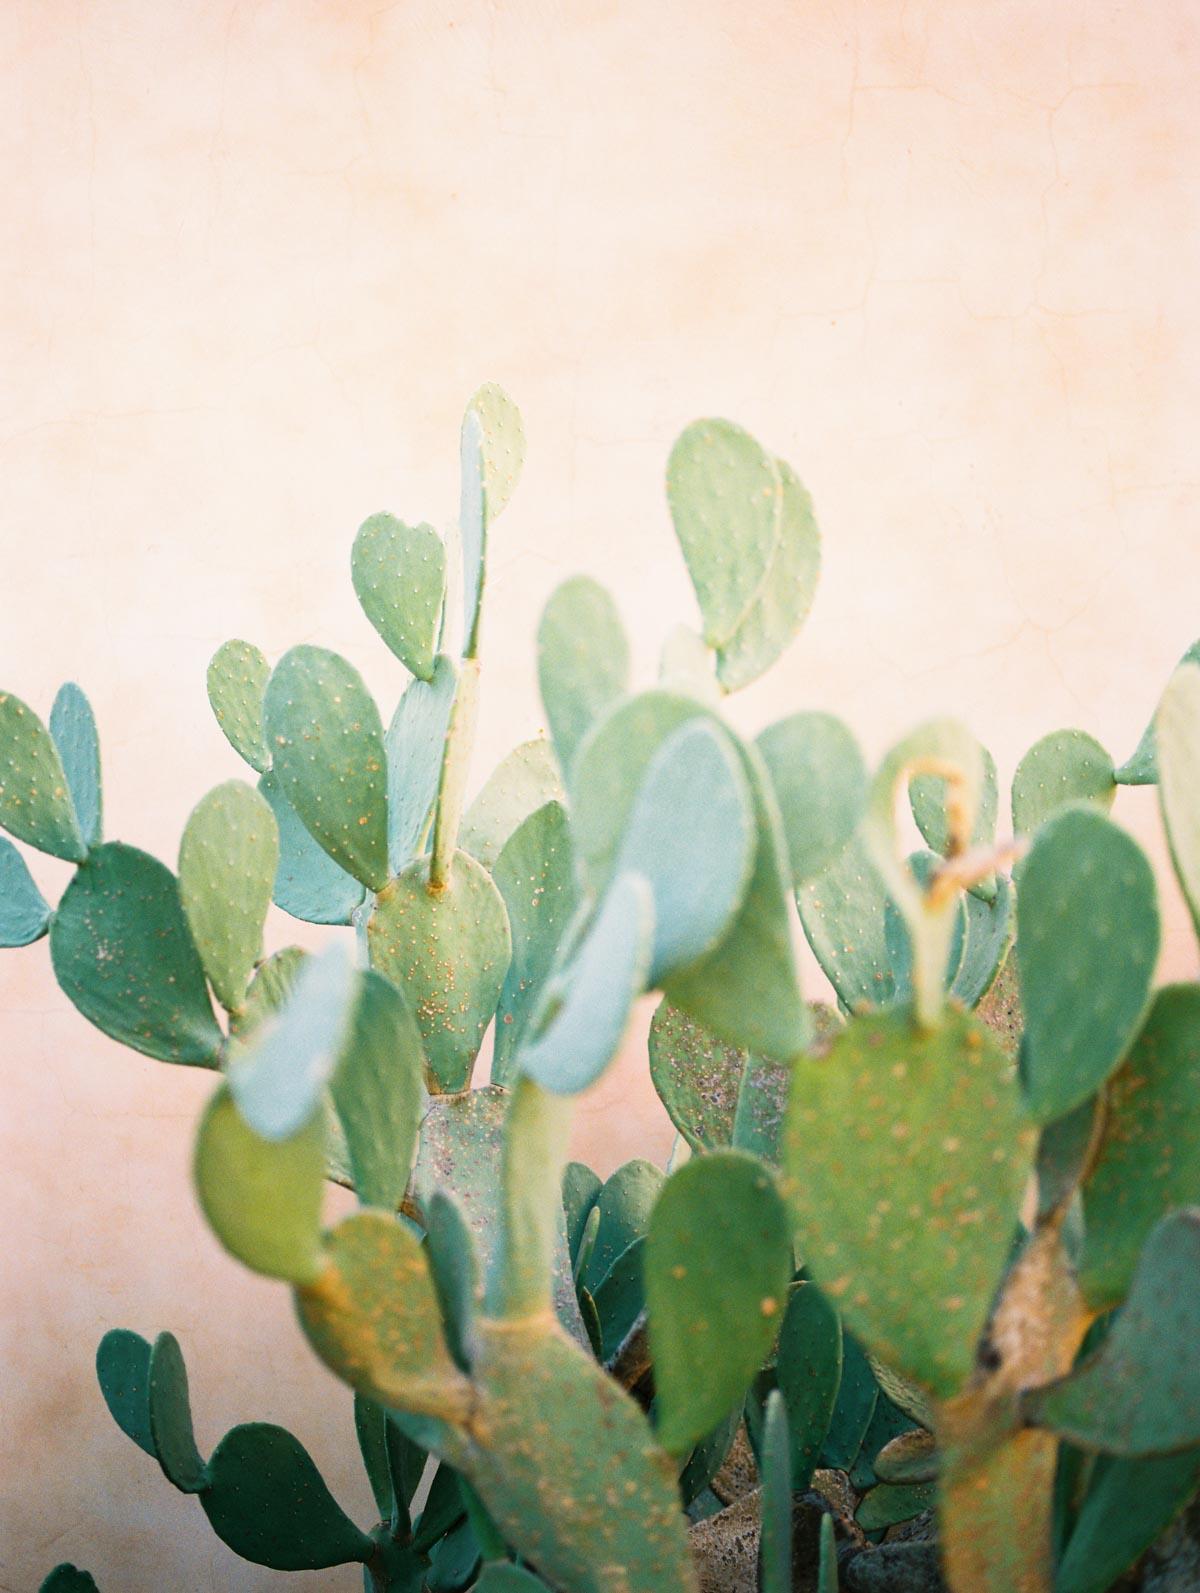 prickly-pear-cactus.jpg